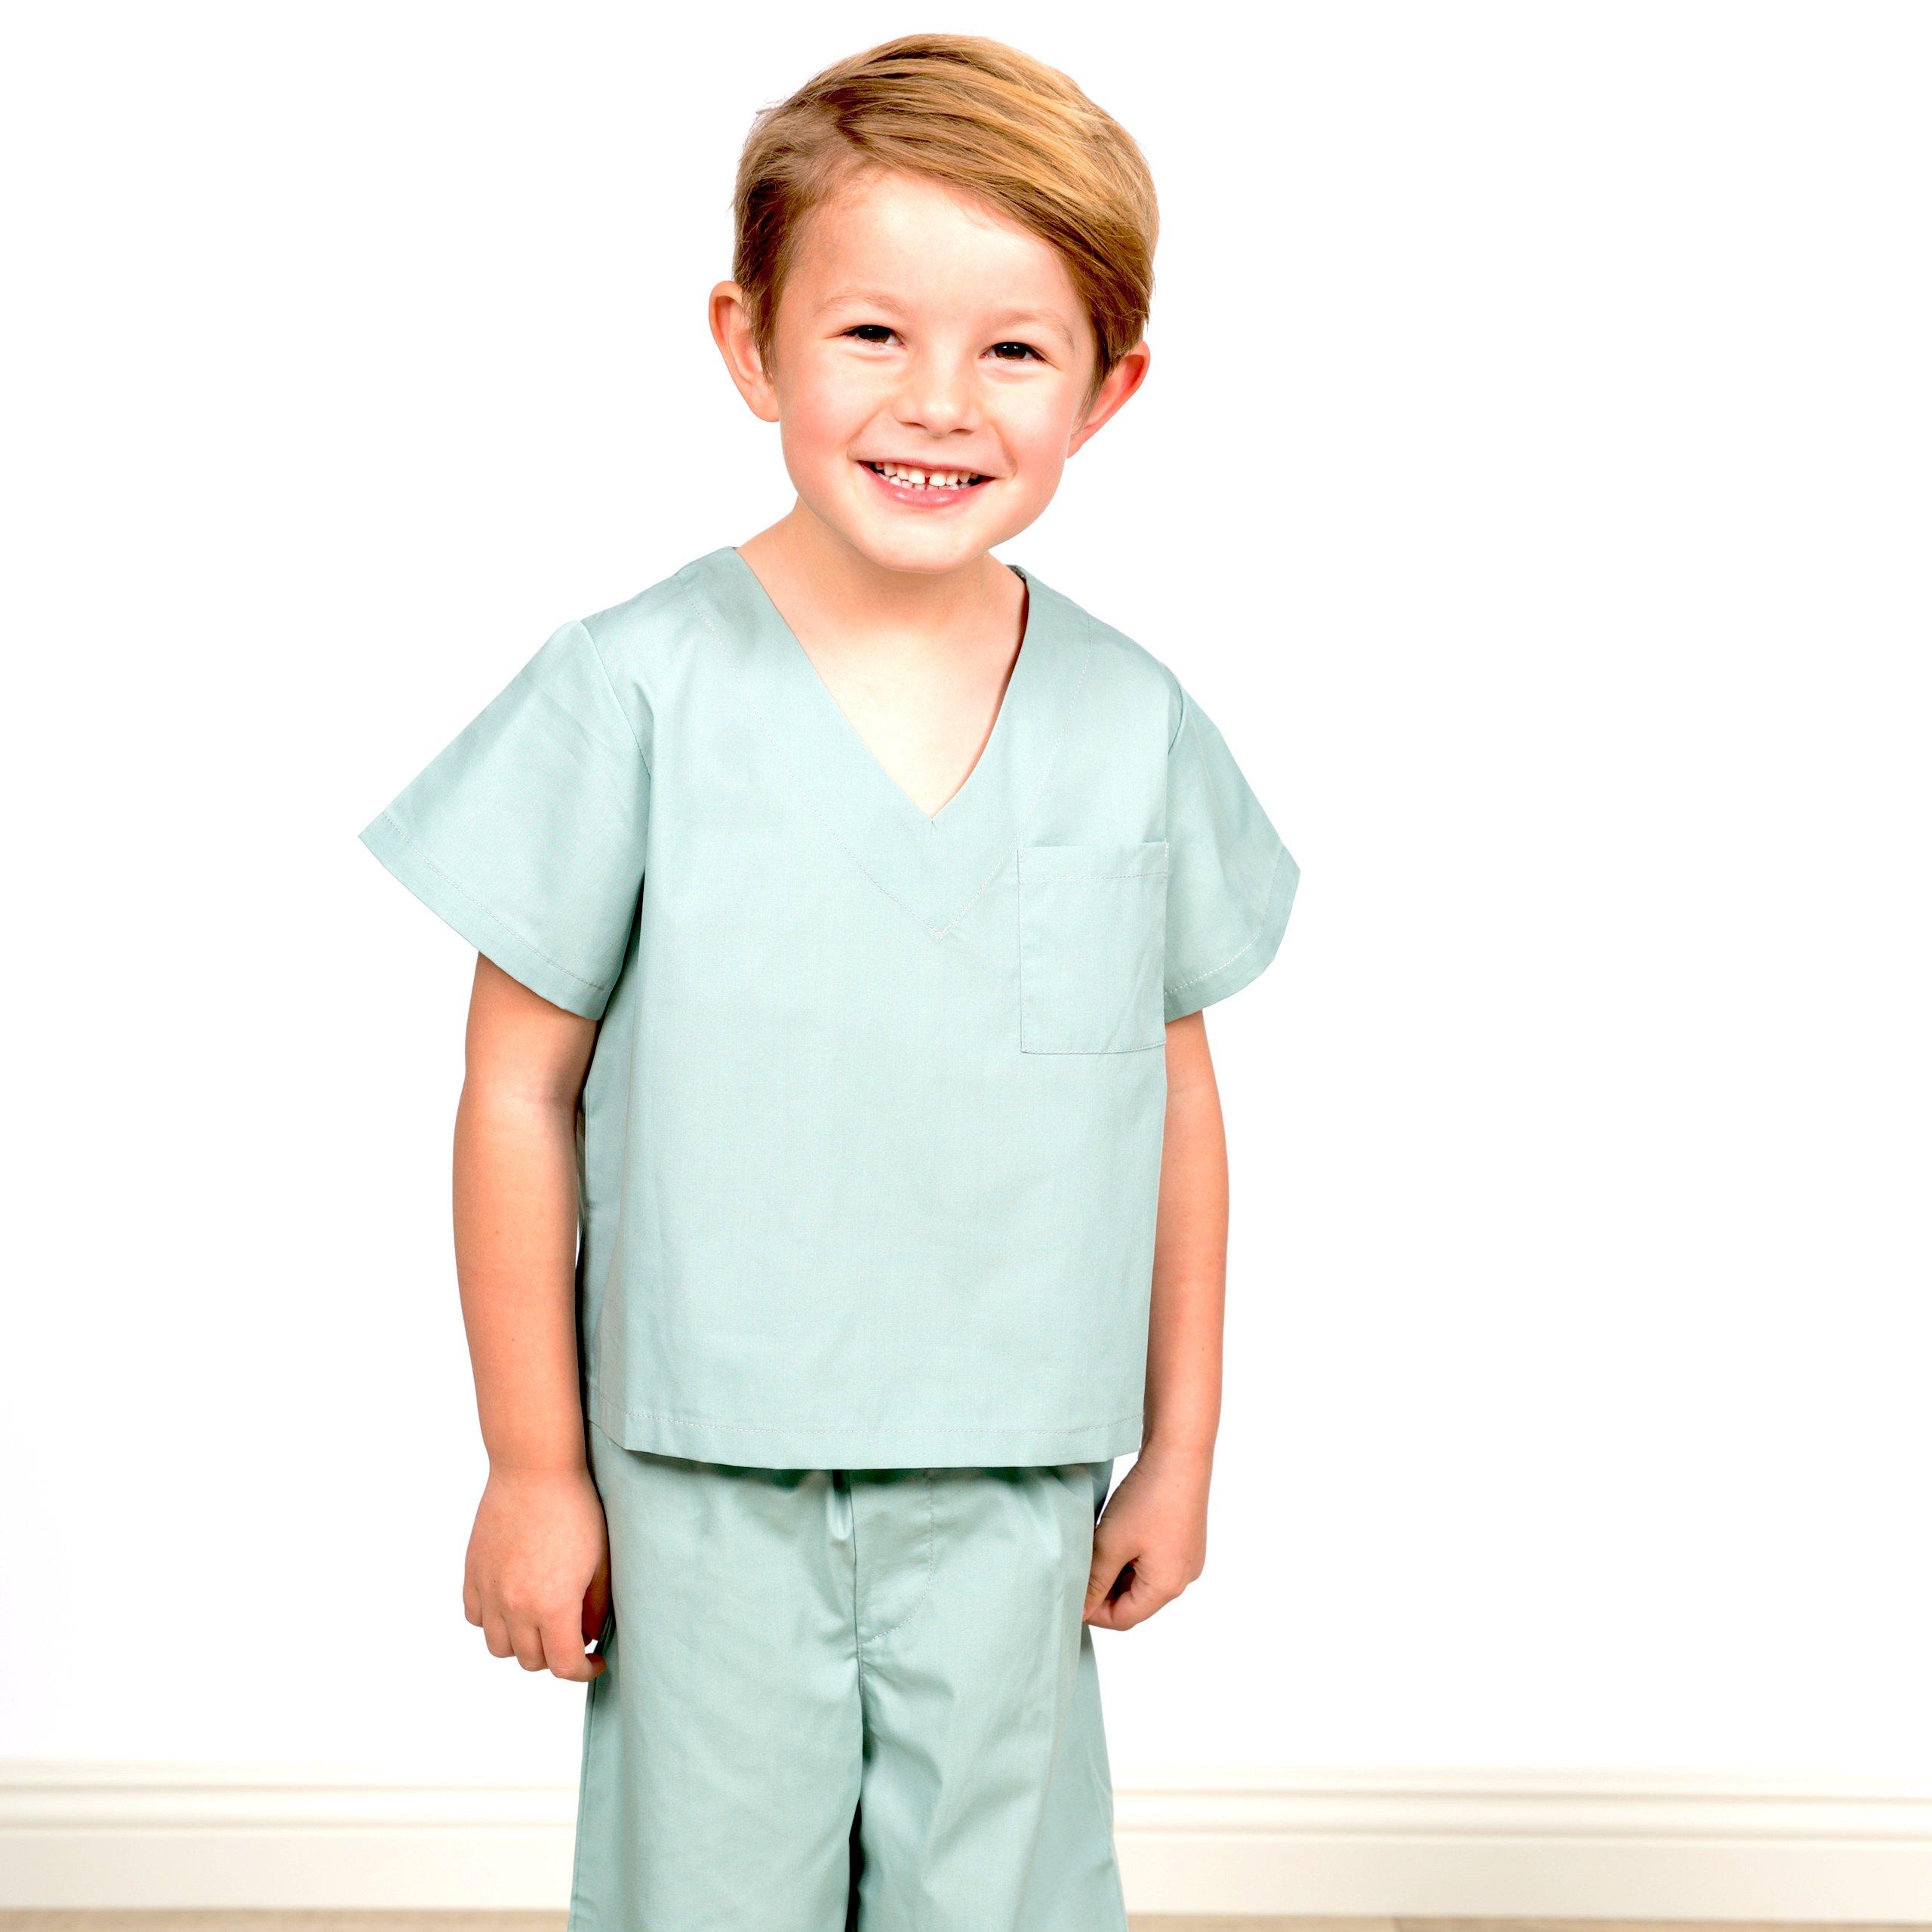 Big Imagination Co. Childrens Doctor Scrubs, Doctor Costume for Kids Age 2-6!